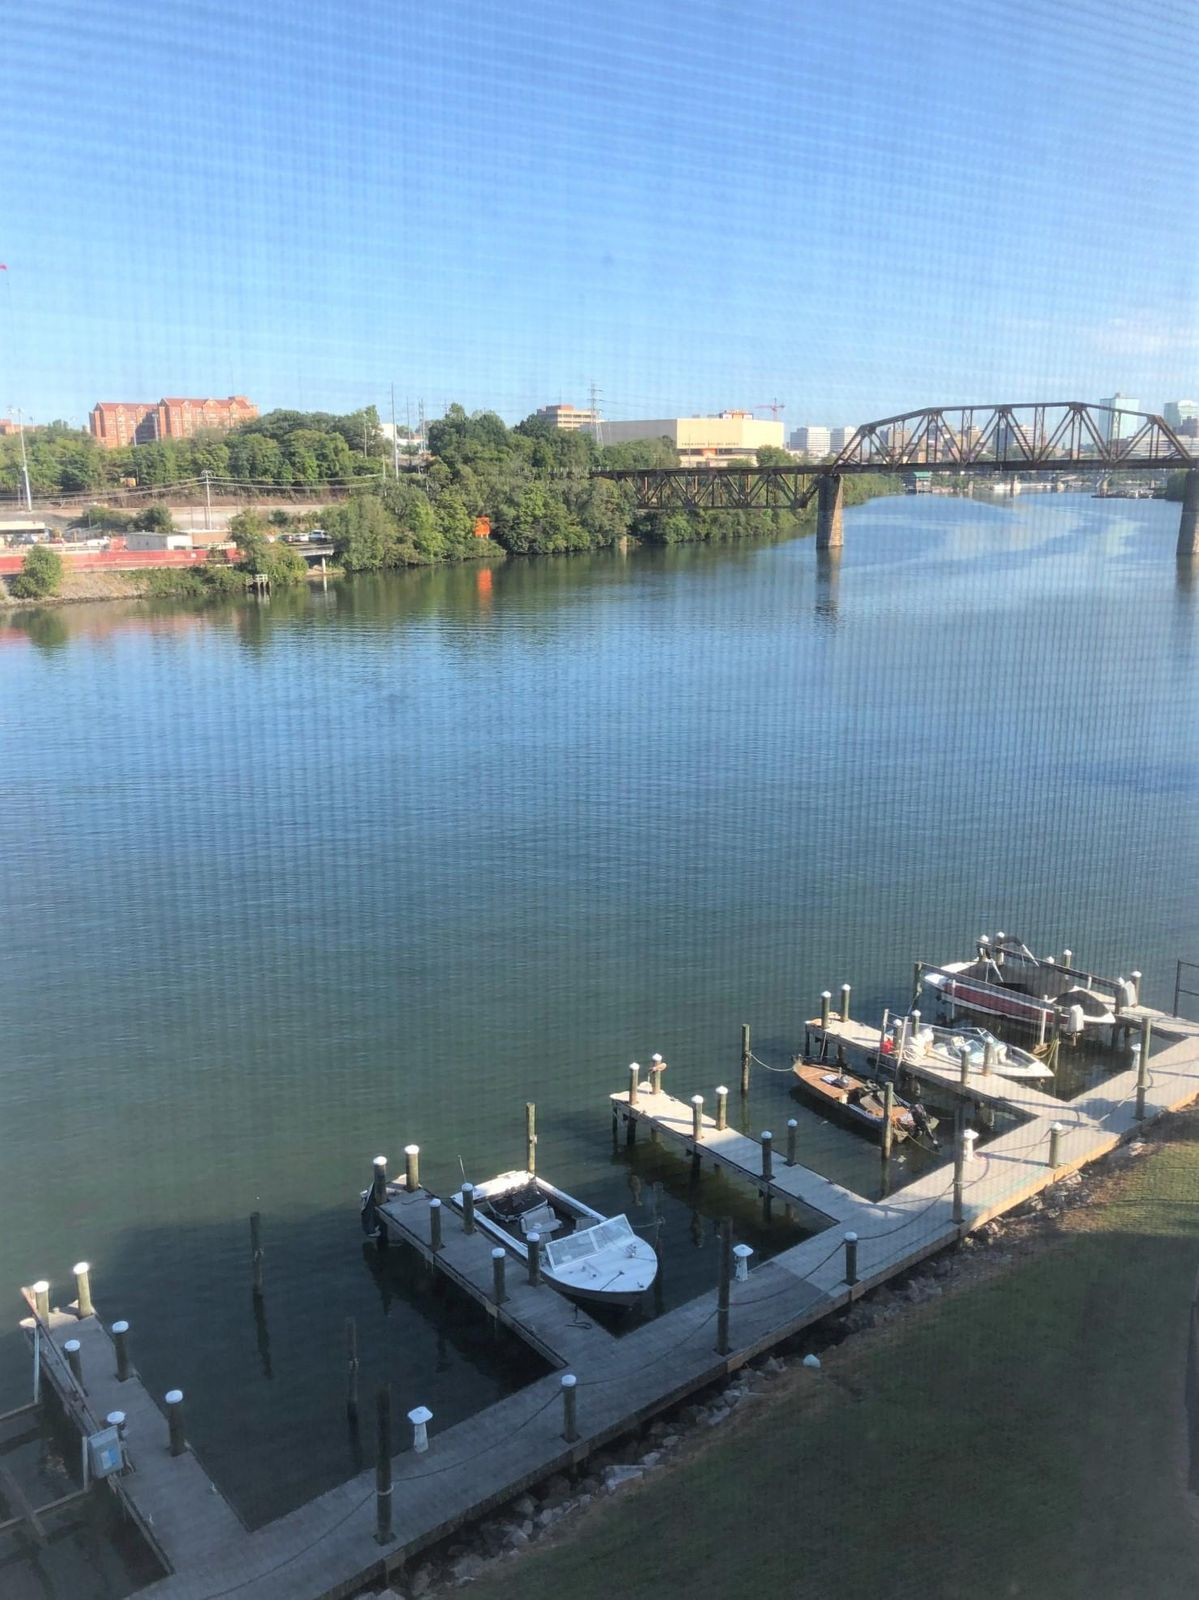 Boat Docks view to UT